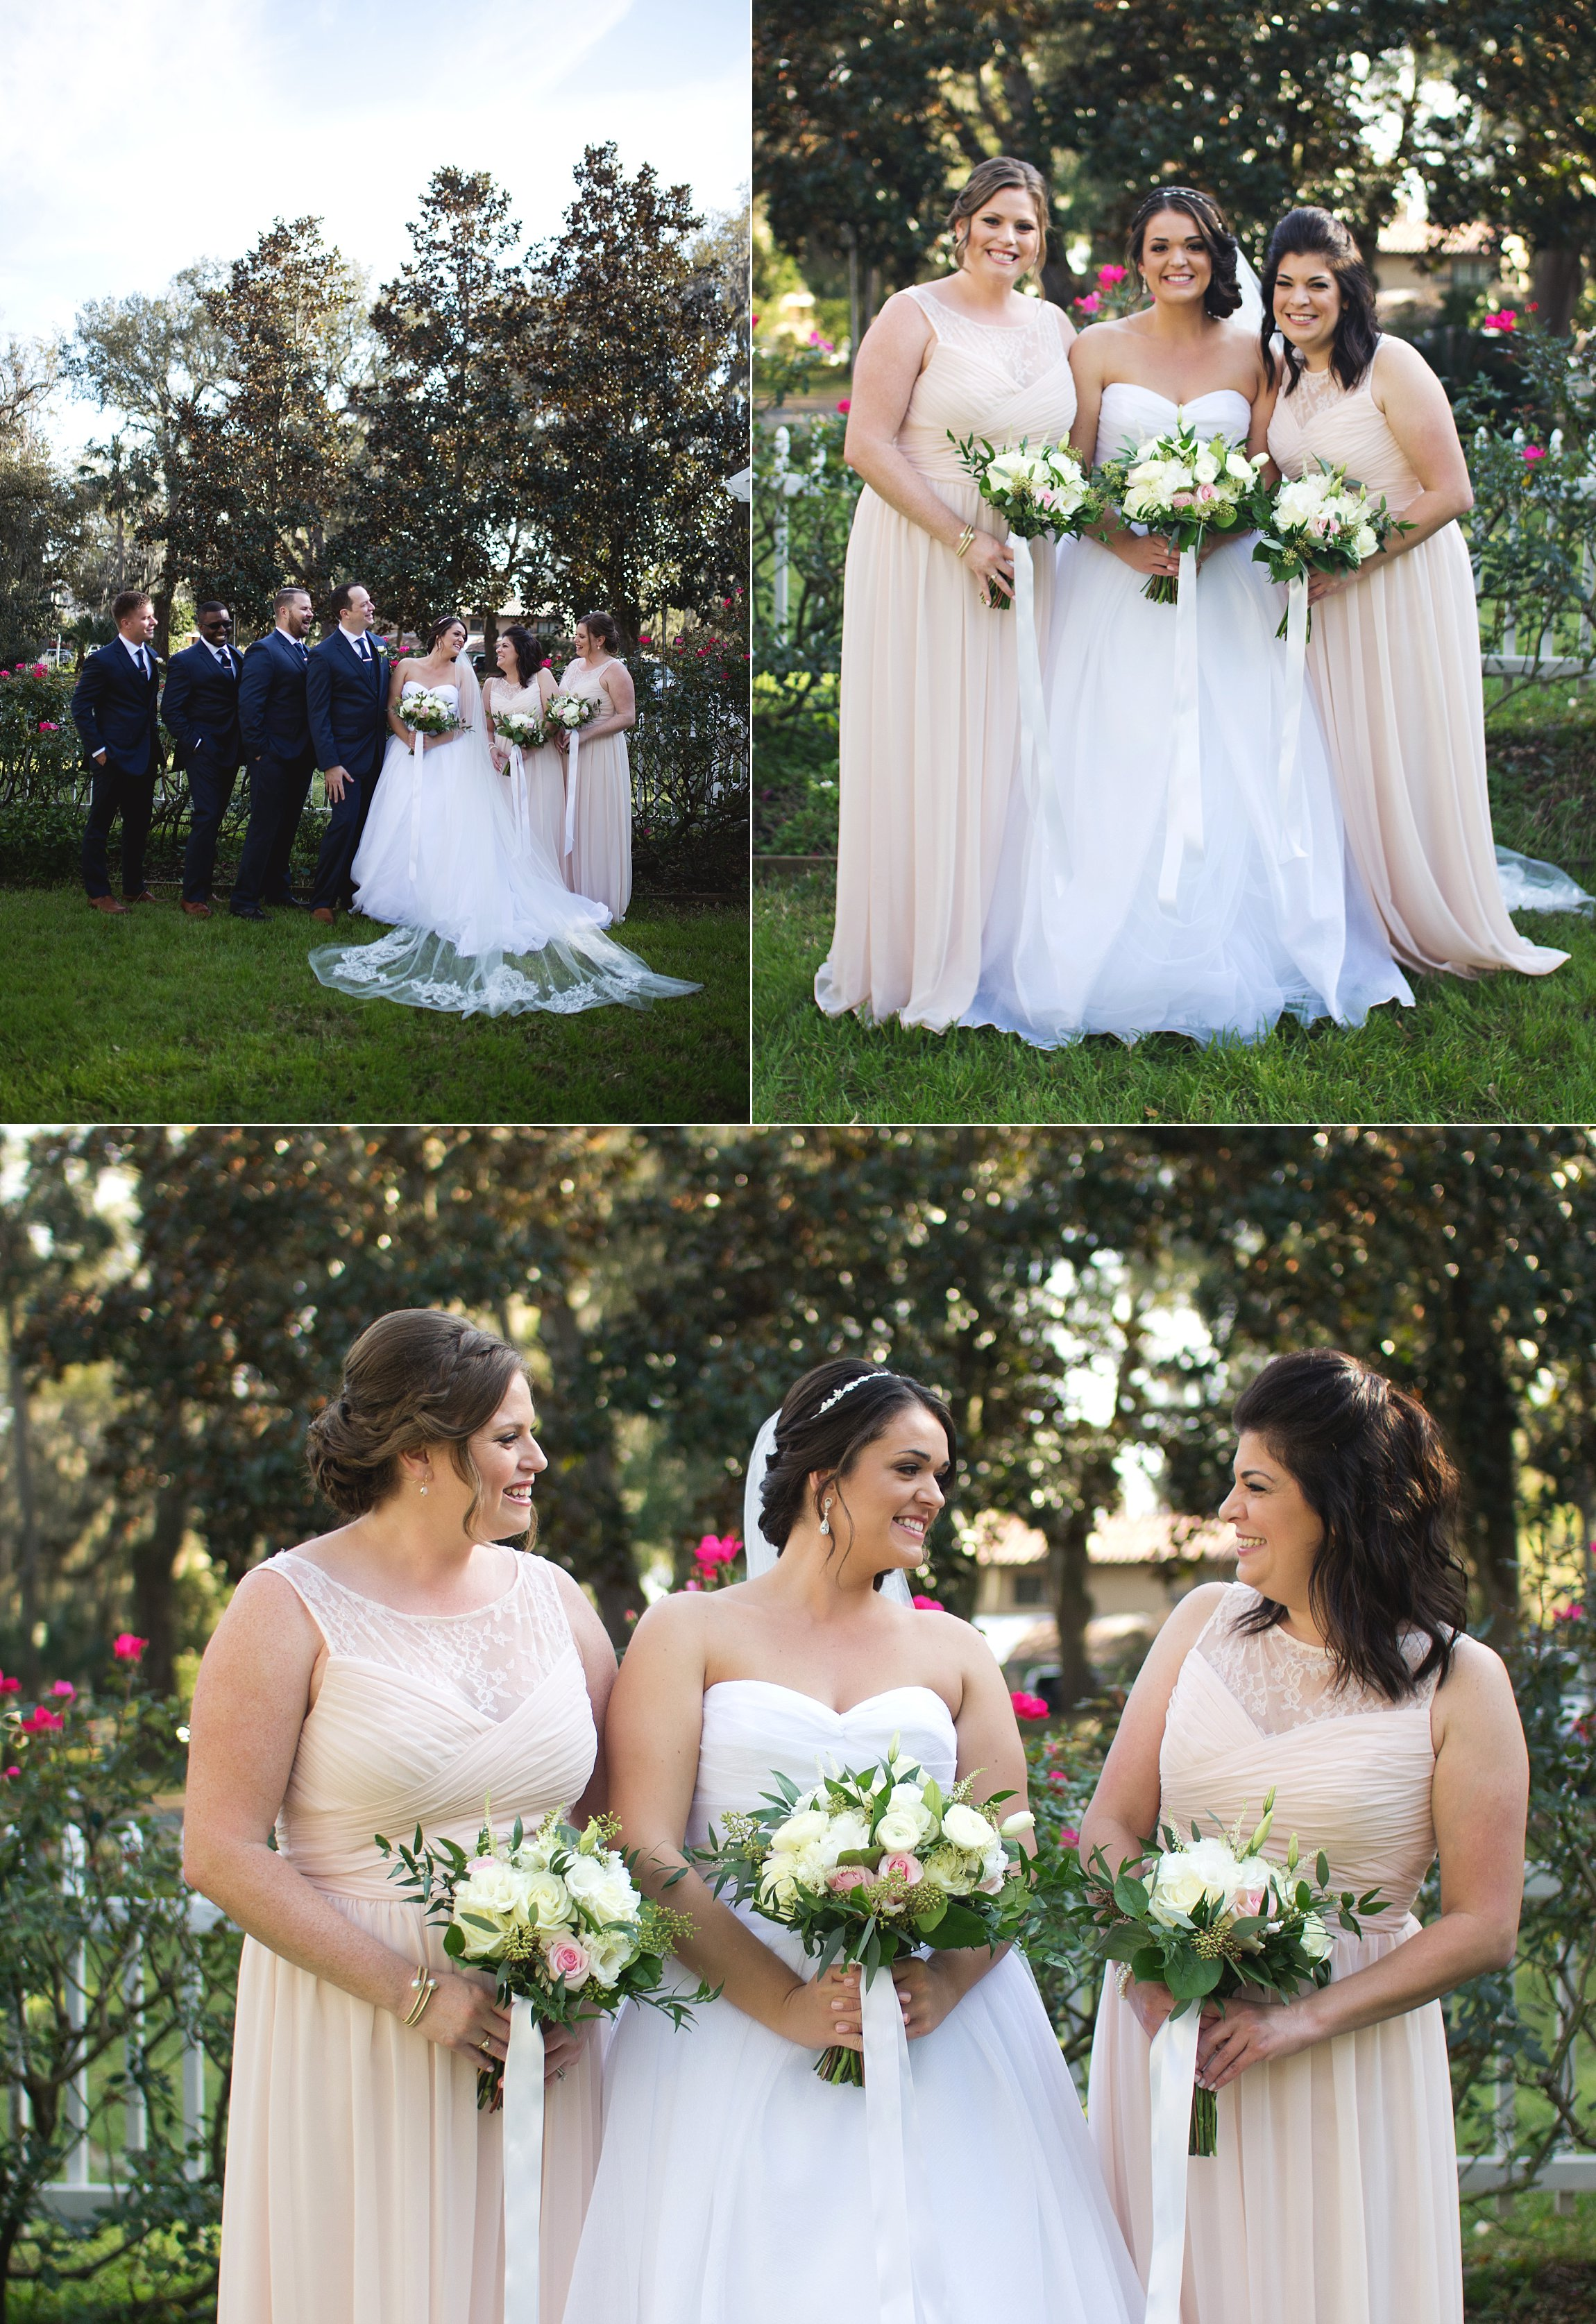 Jacksonville-Florida-Wedding-Photographer-West-House-Photography_0014.jpg